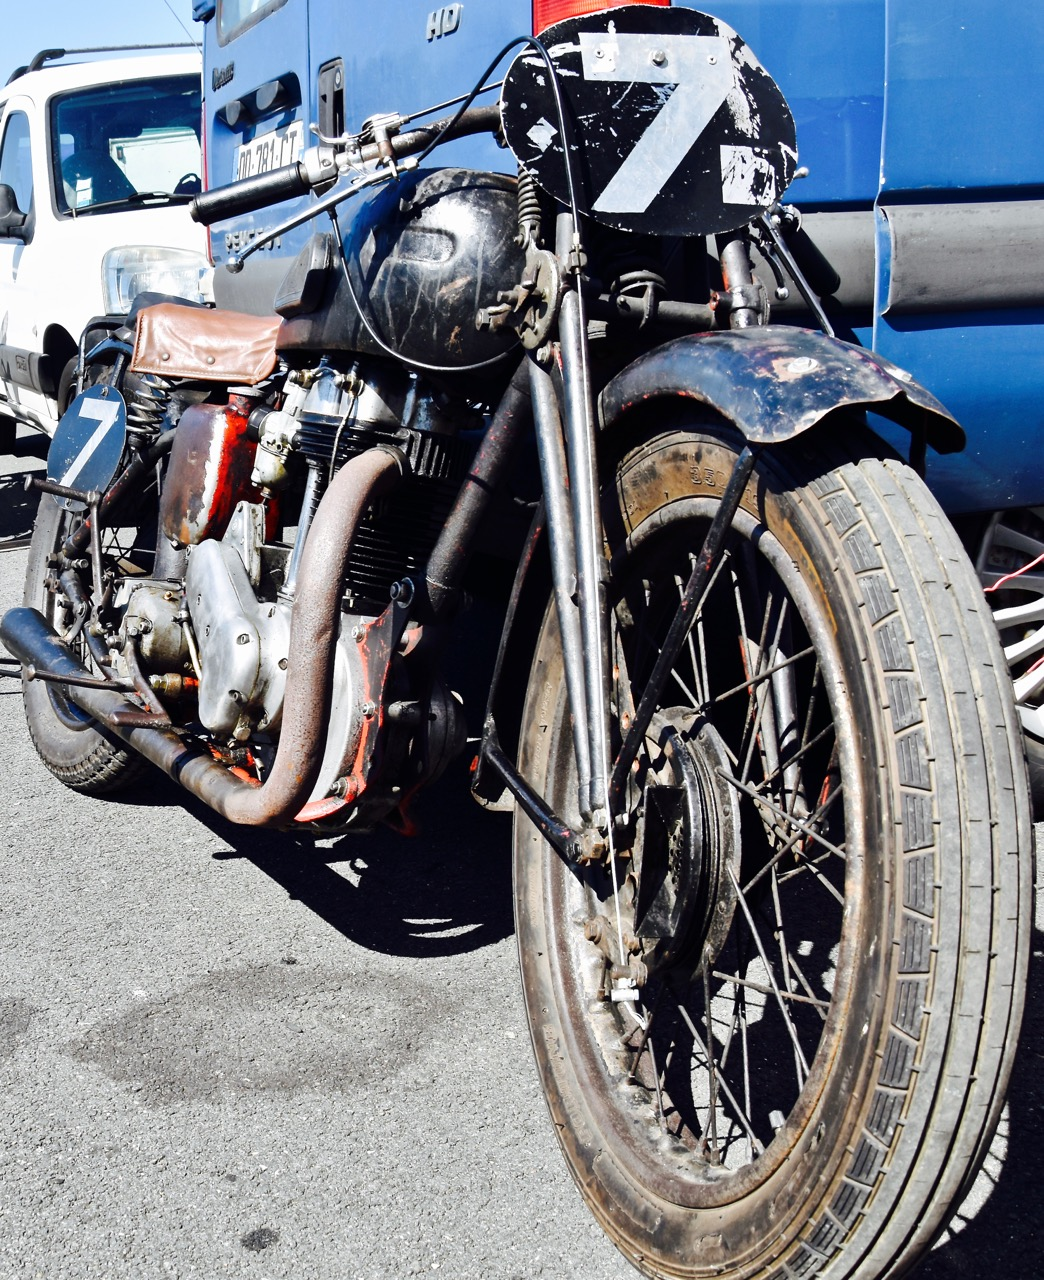 klassieke Franse motorfietsen